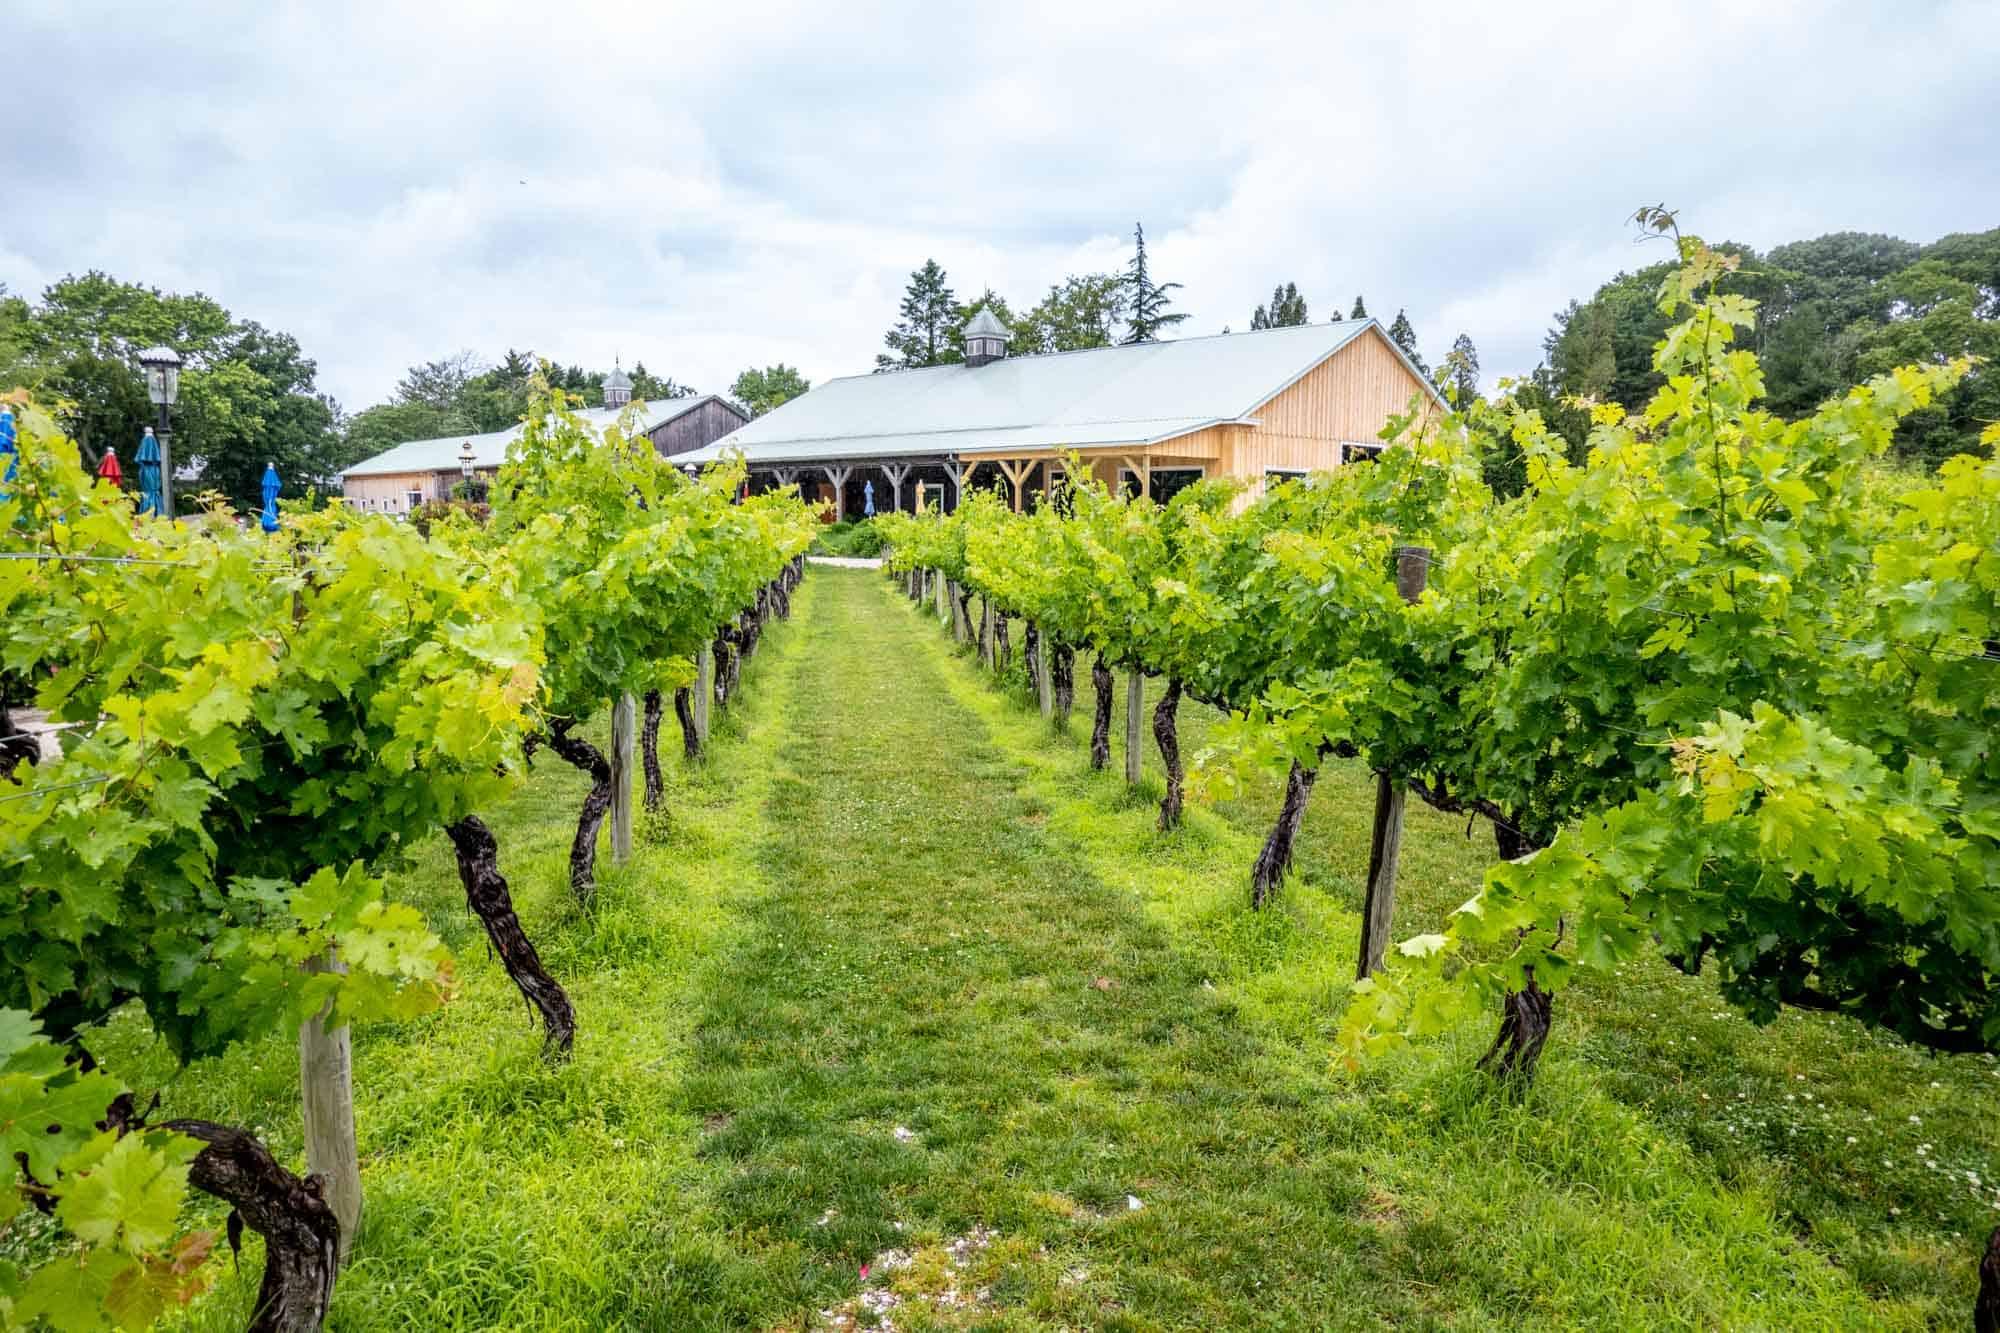 Grape vines at Cape May Winery